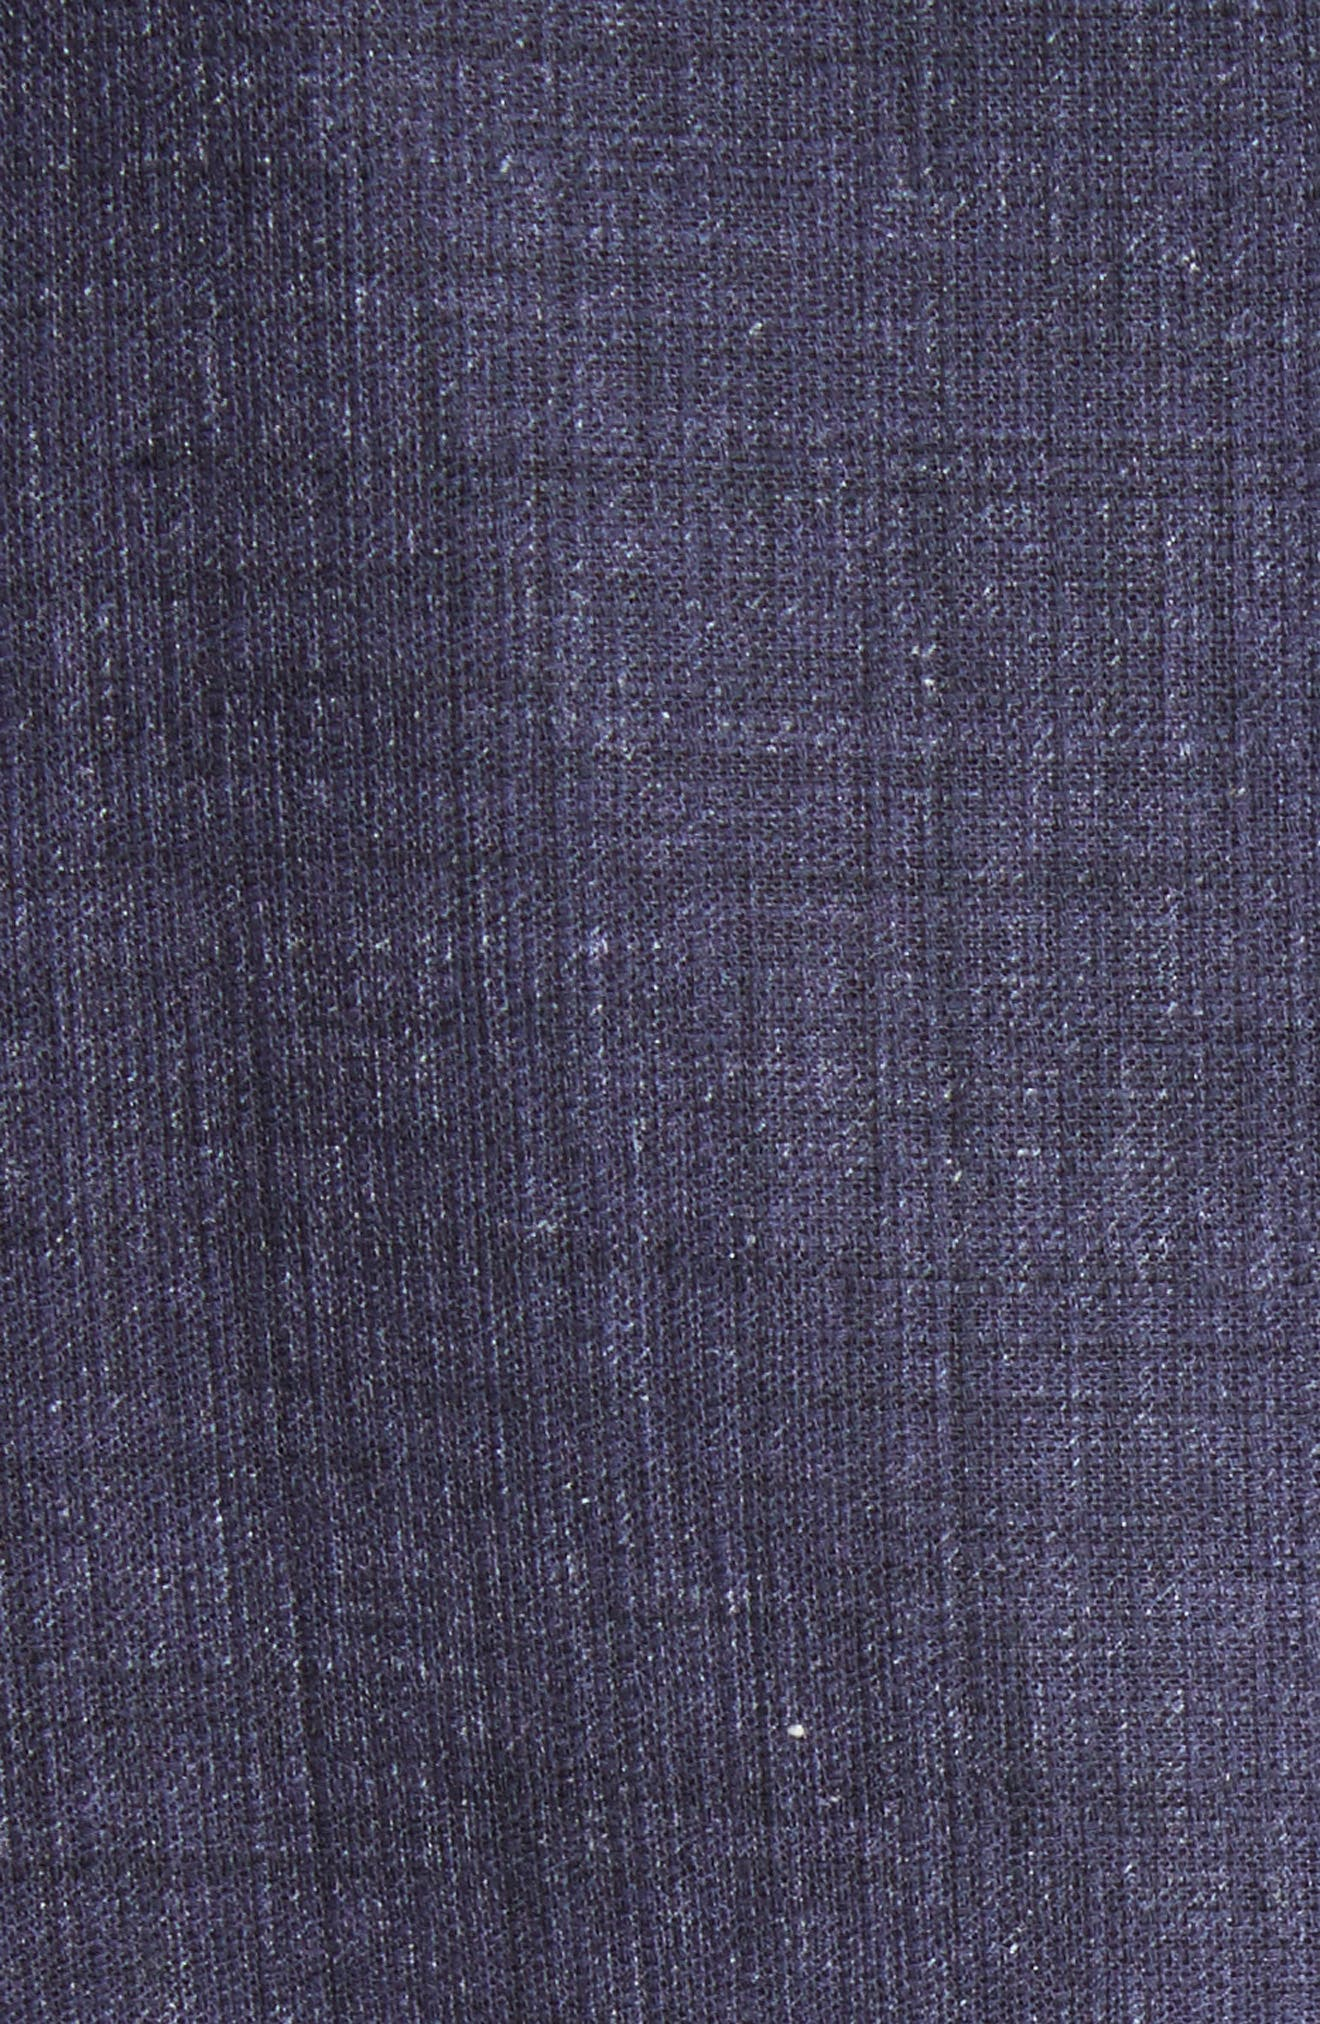 Hana Print Chambray Dress,                             Alternate thumbnail 5, color,                             438